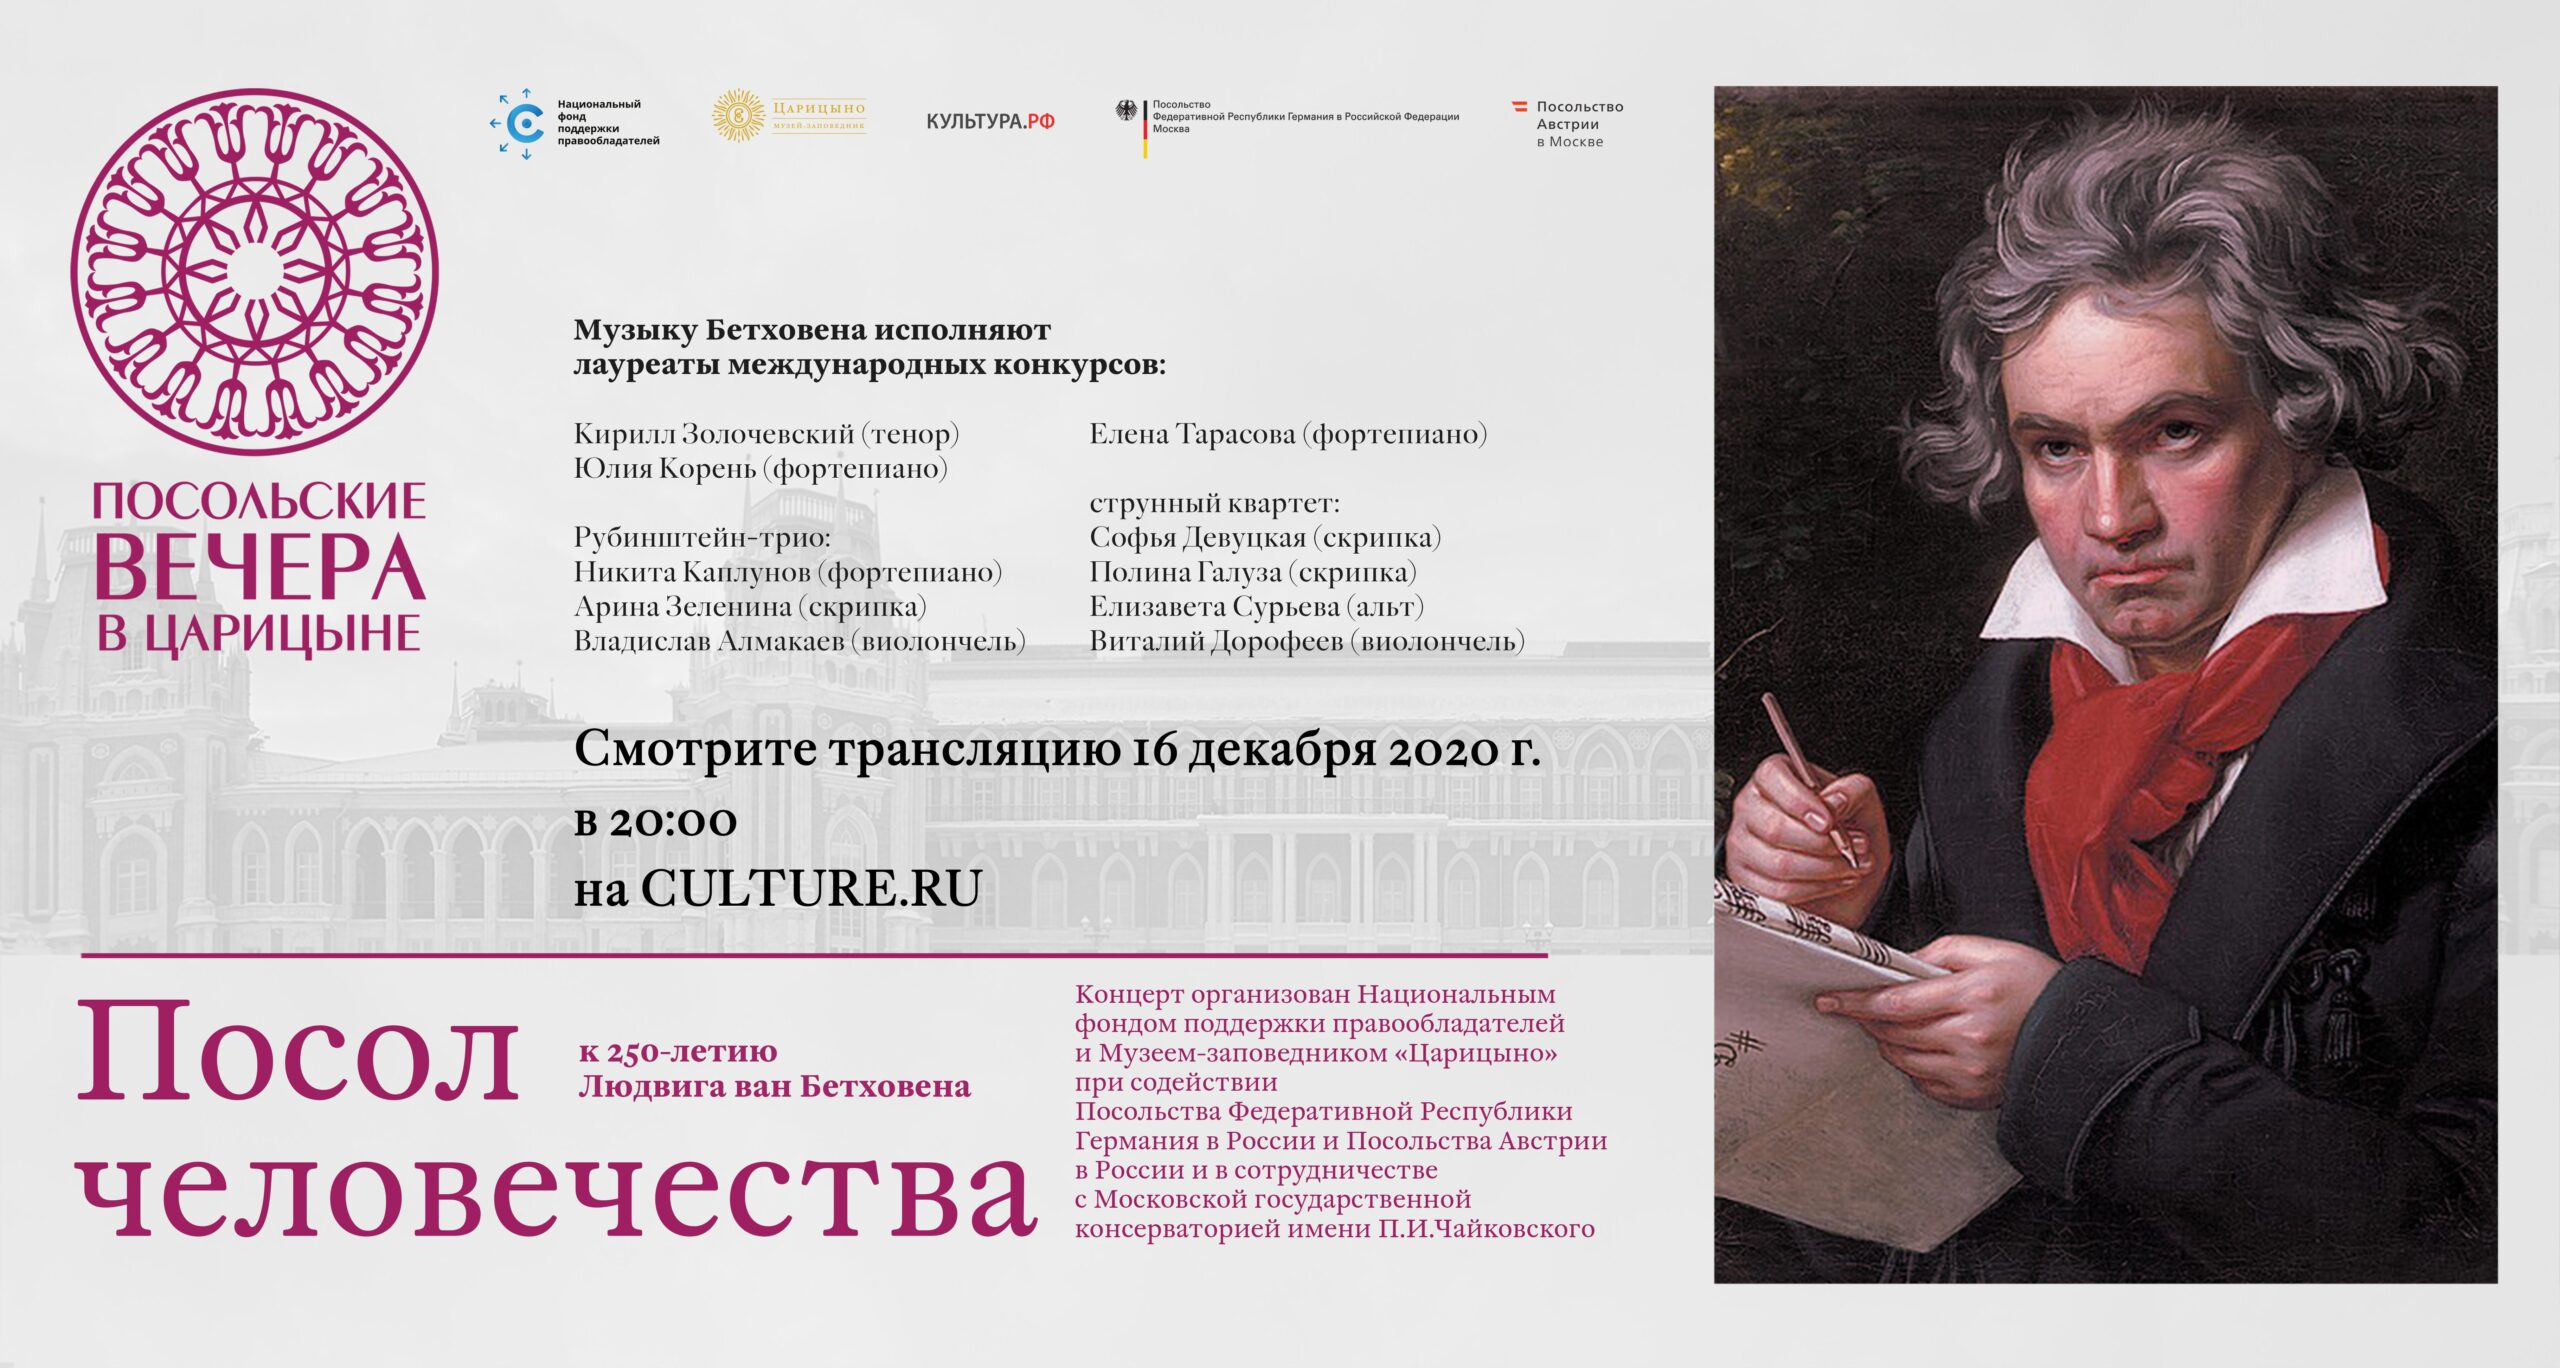 Музыка Бетховена в Царицыне: концерт к 250-летию классика